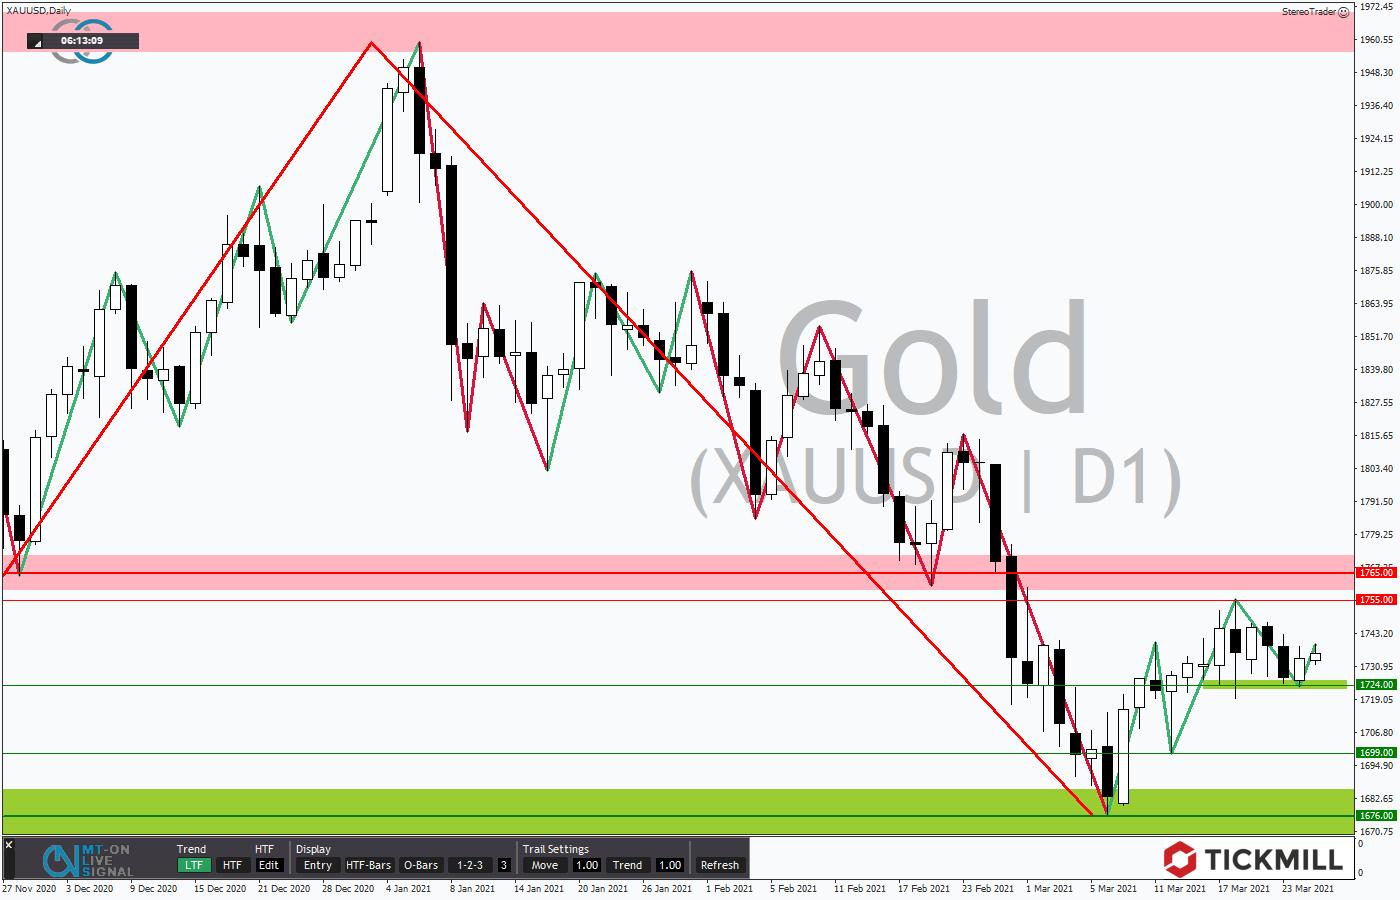 Tickmill-Analyse: GOLD im Tageschart